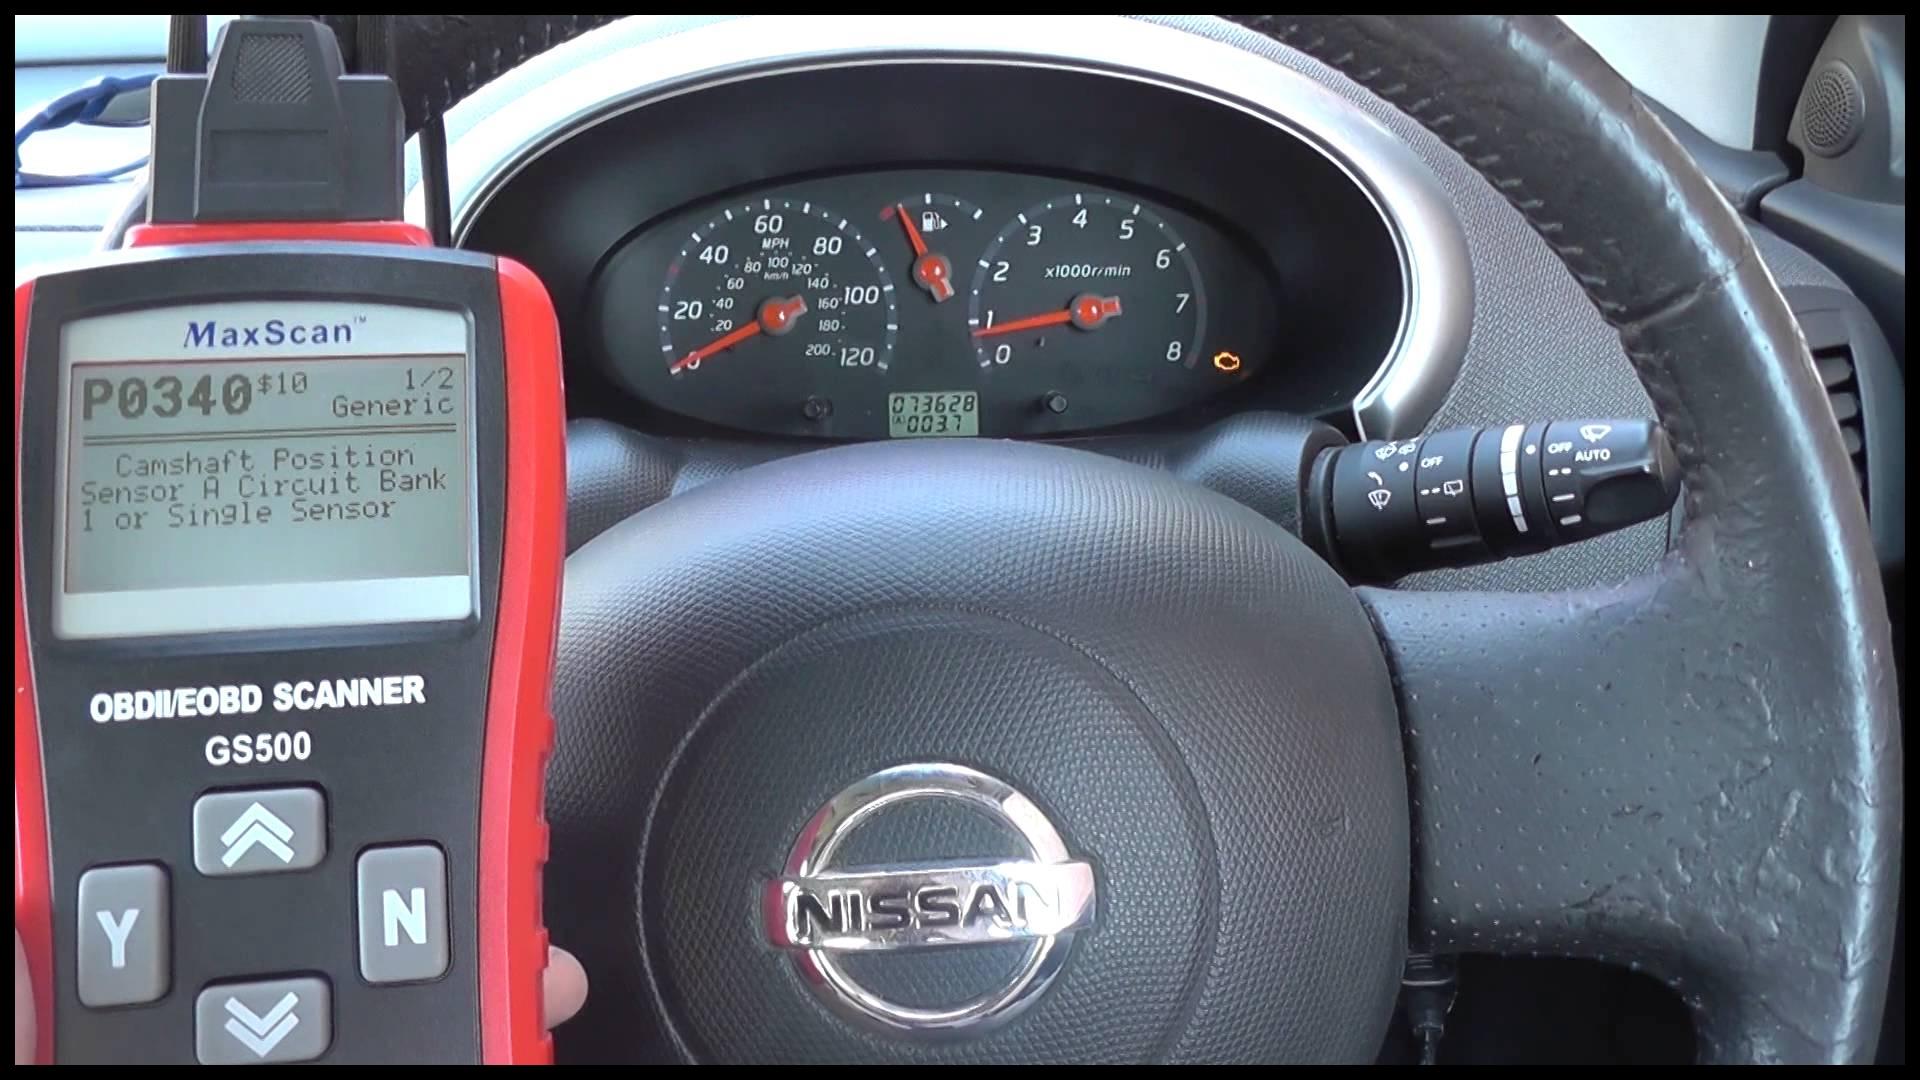 P0444 P0340 Camshaft & Purge Valve Nissan Engine Light Diagnose & Reset